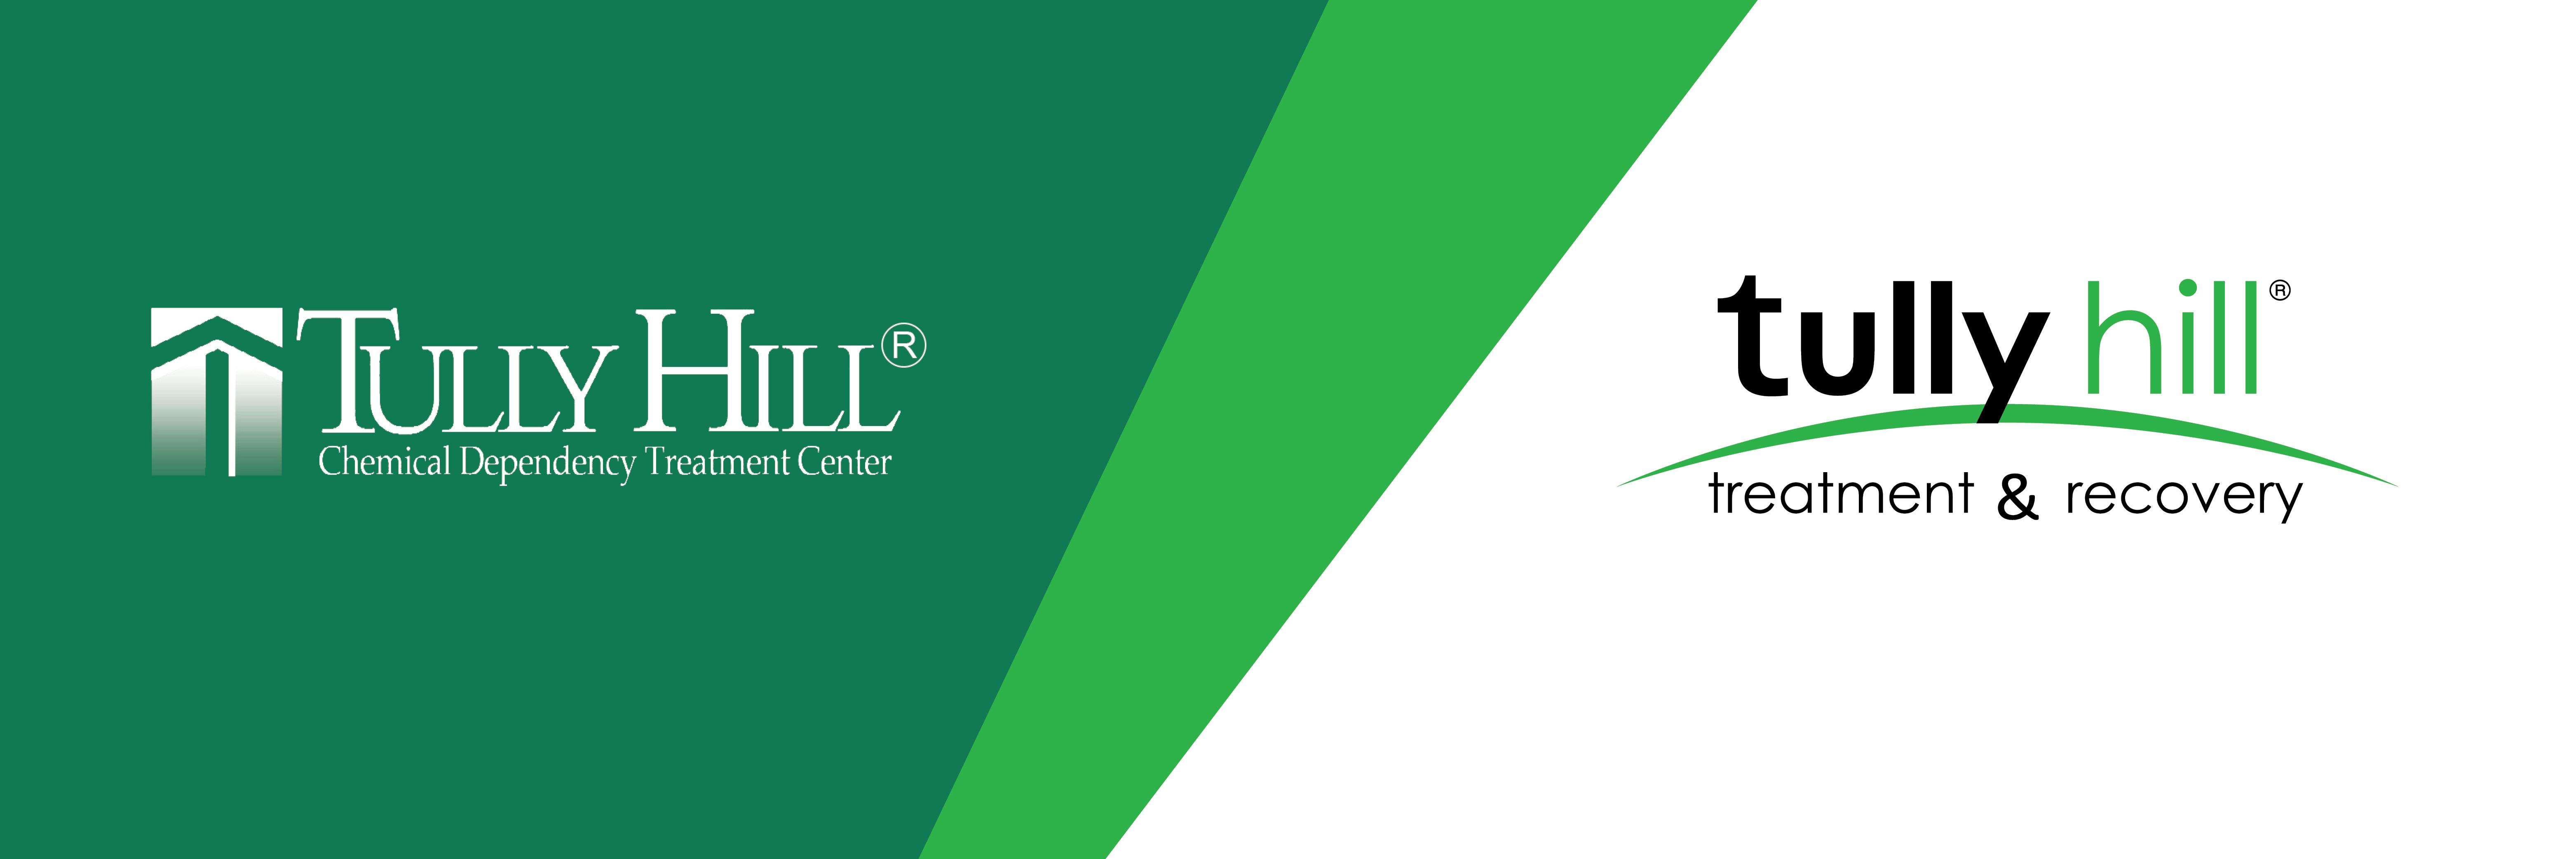 TH_logos_banner